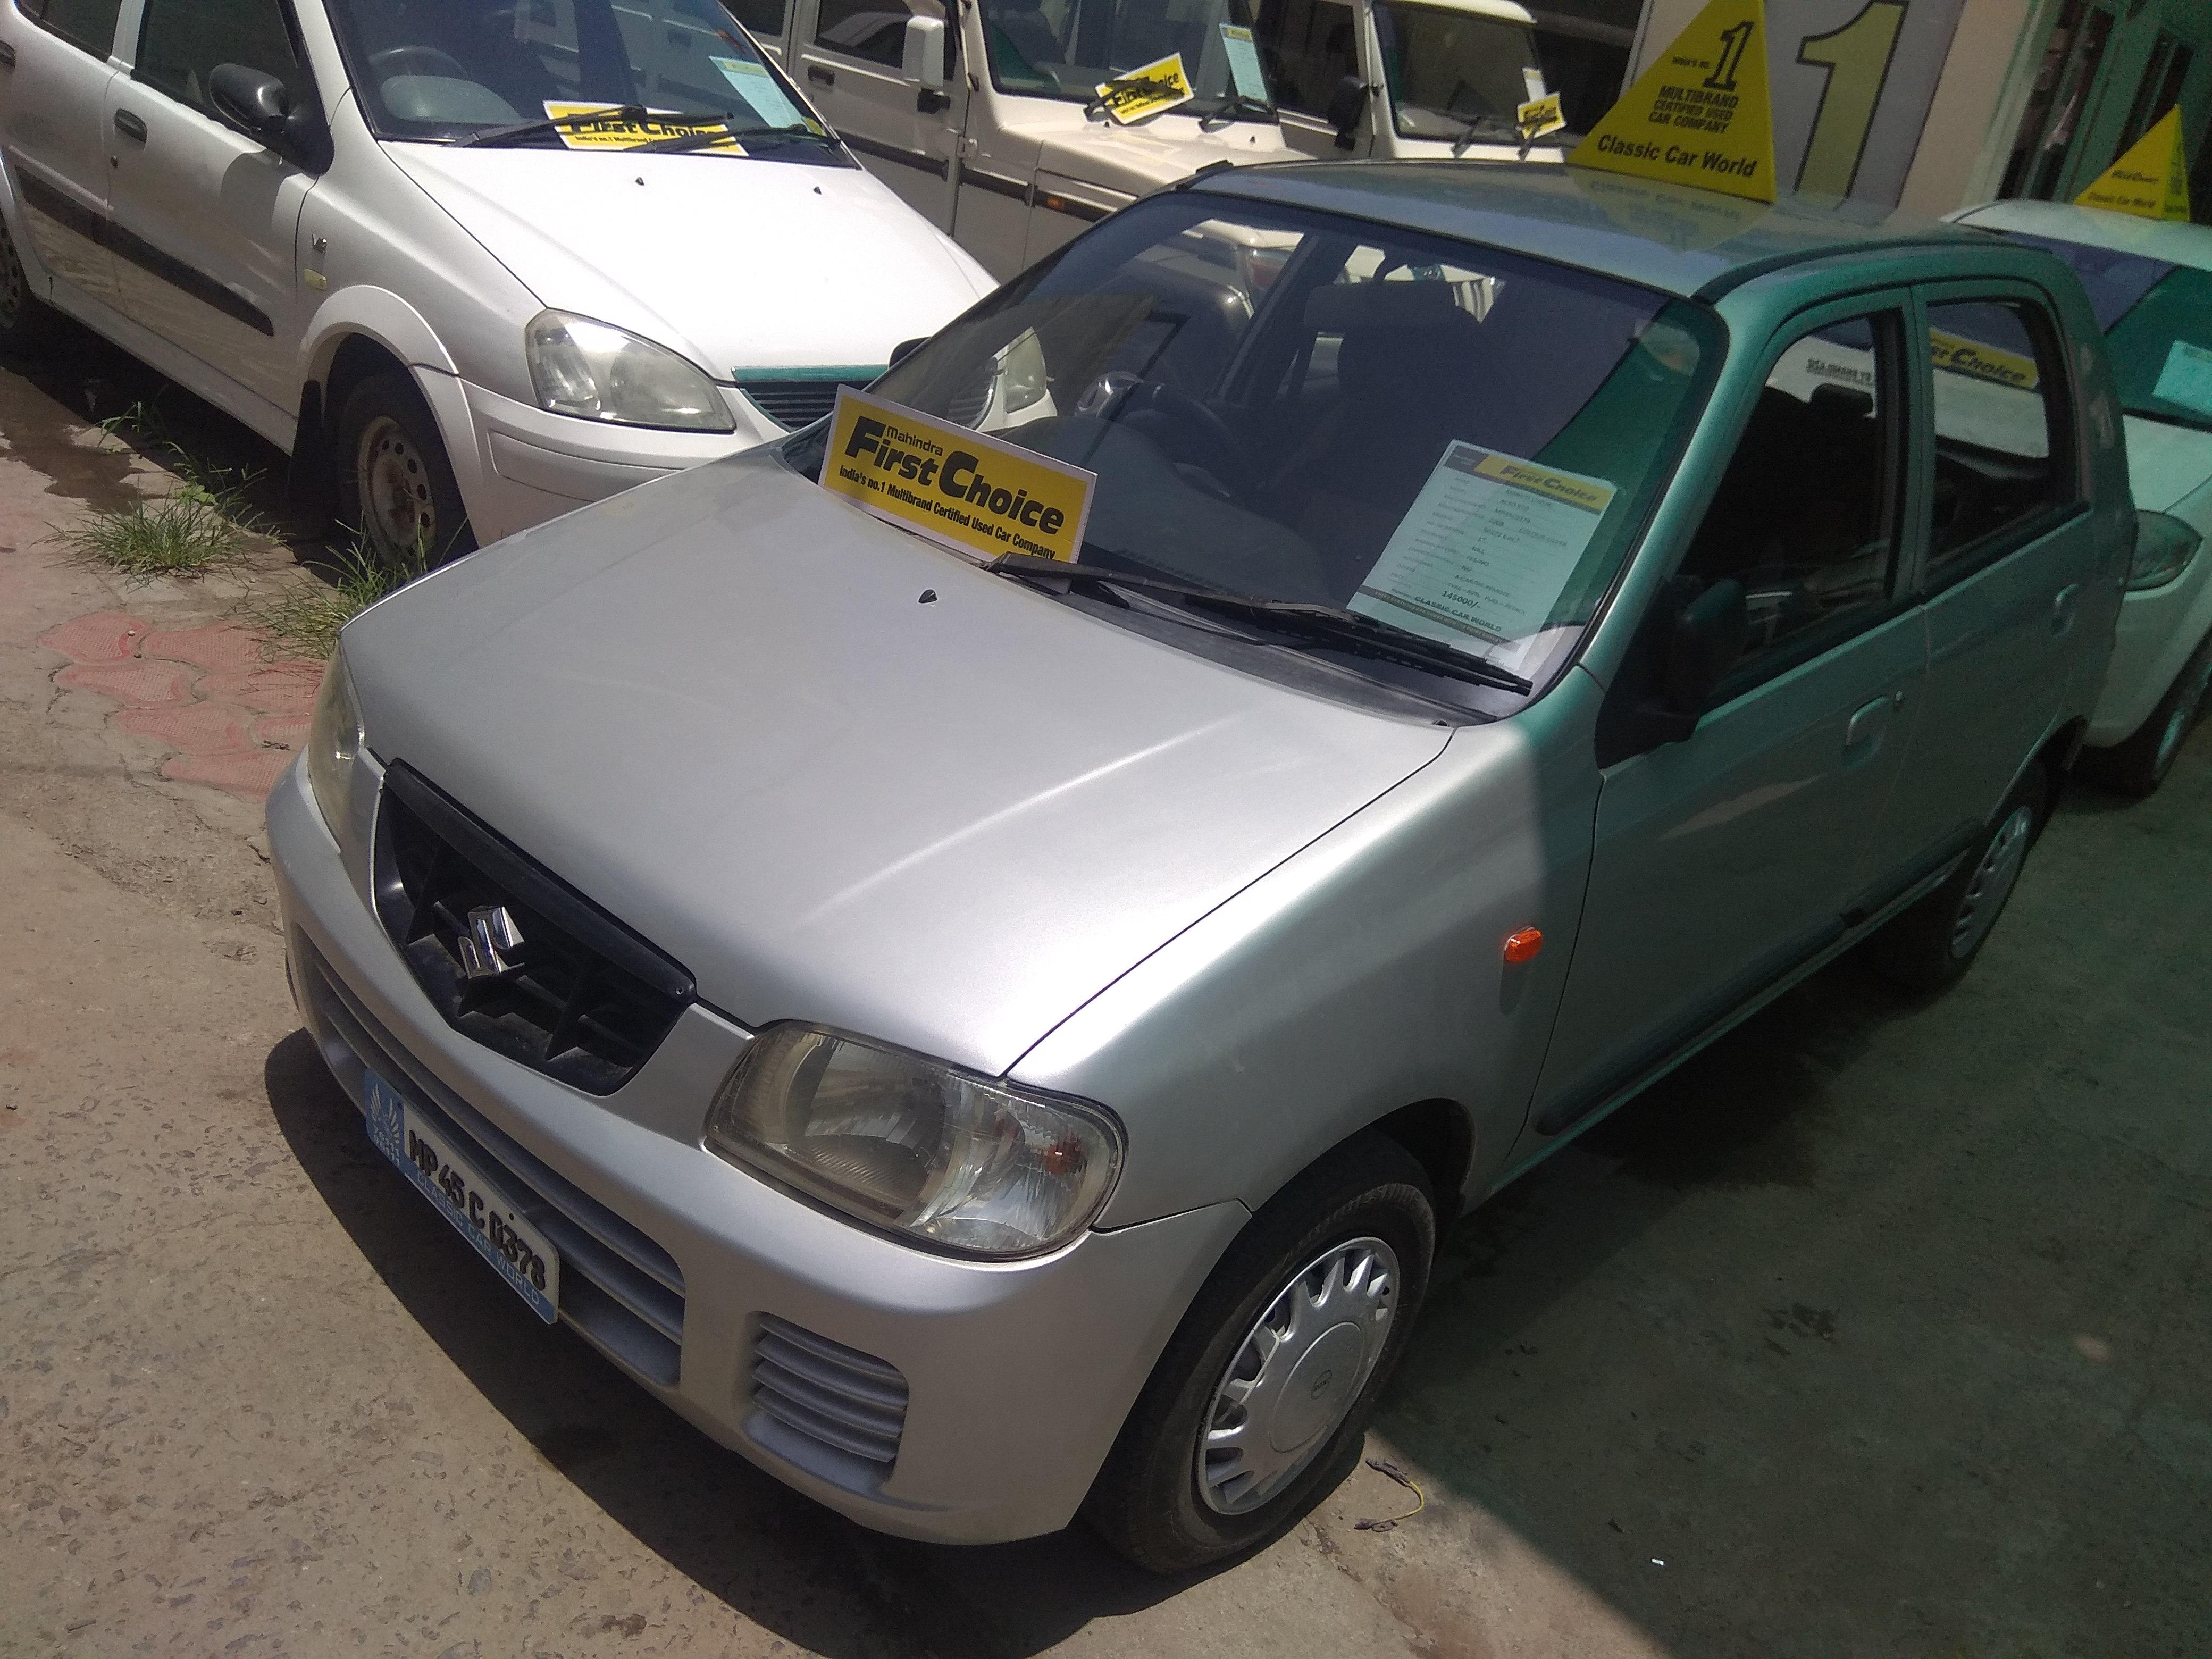 Used Maruti Suzuki Alto In Indore Mahindra First Choice